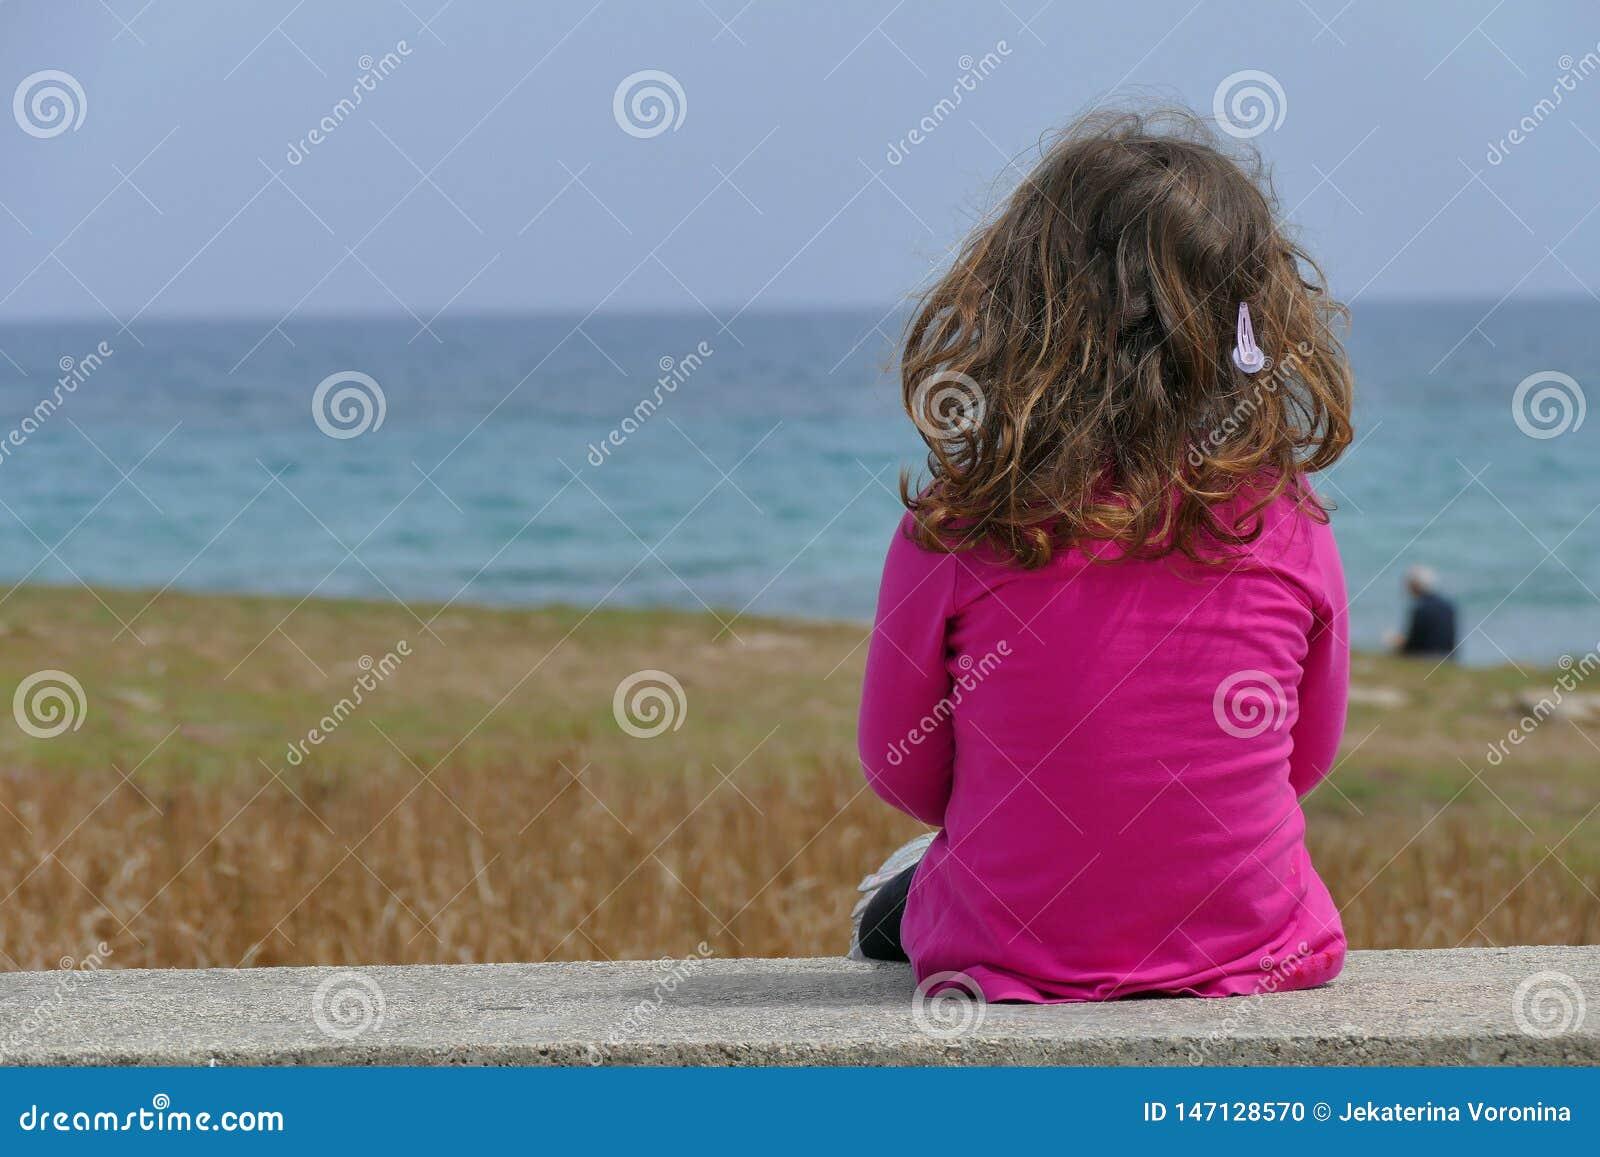 3-4 fille an regardant la mer